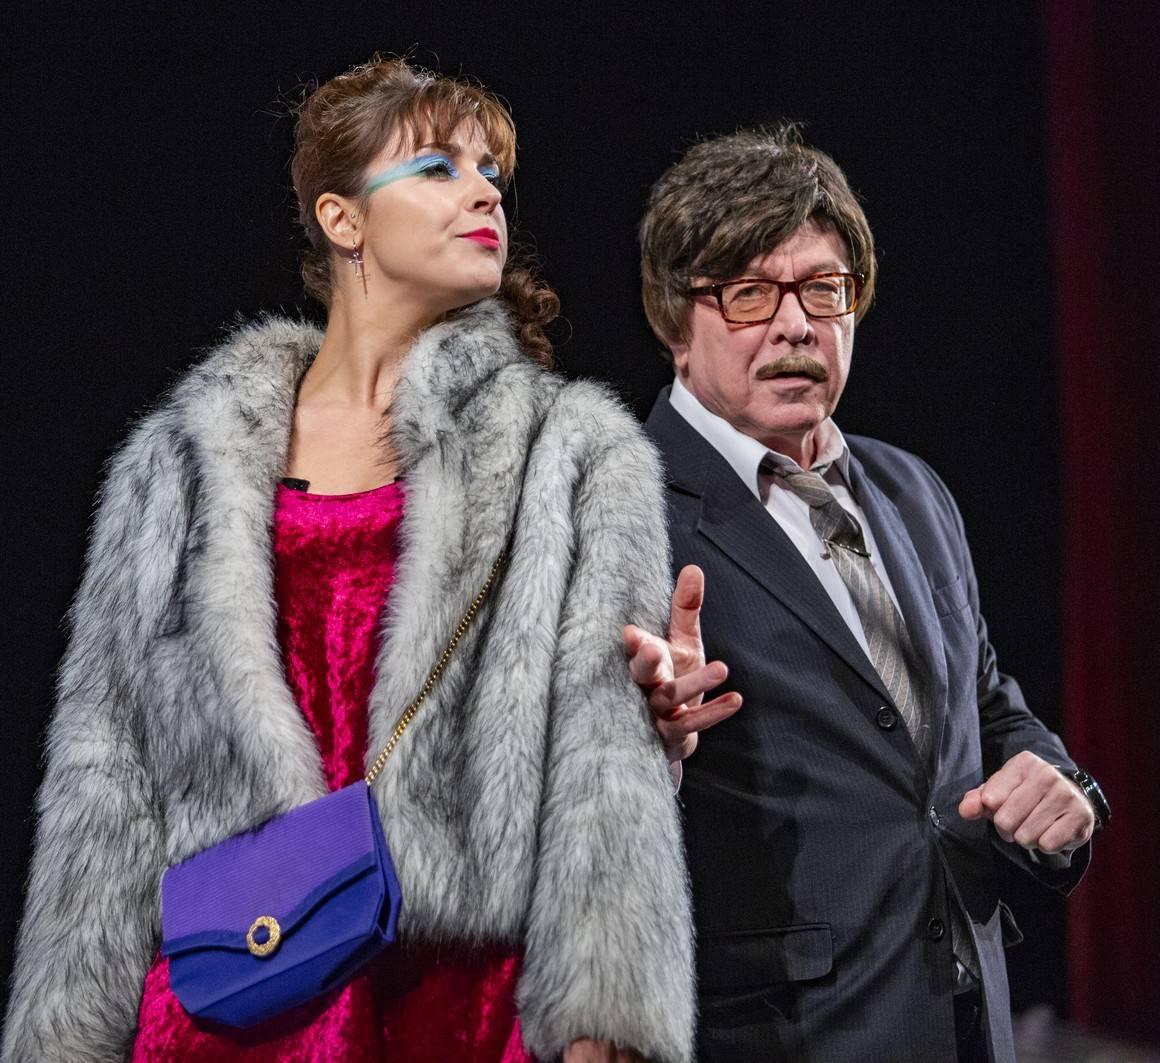 Театр сатиры: онлайн-трансляция спектакля «Хомо Эректус» 12 мая